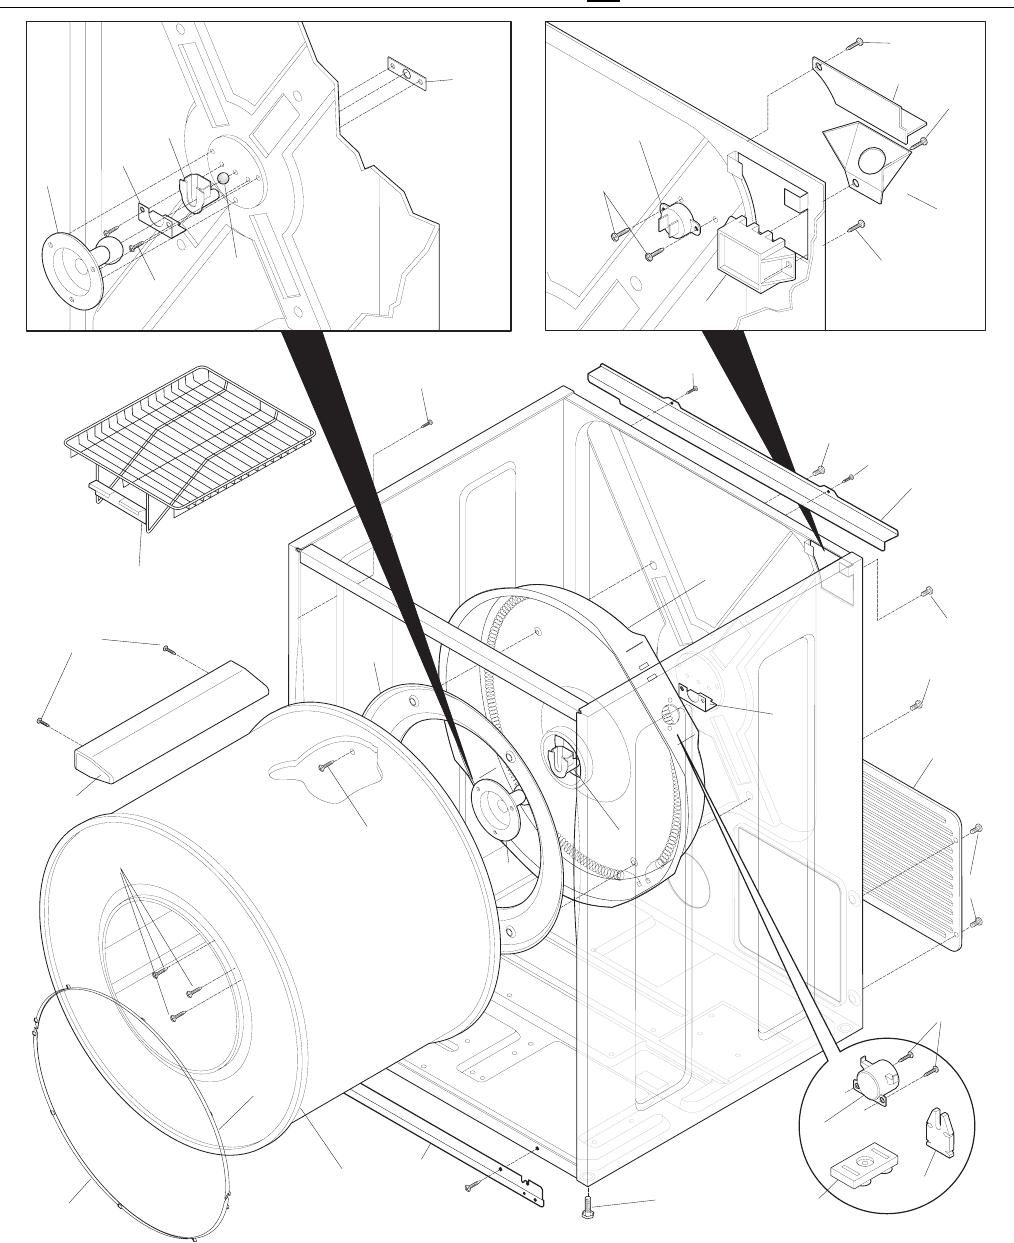 34 Frigidaire Dryer Parts Diagram